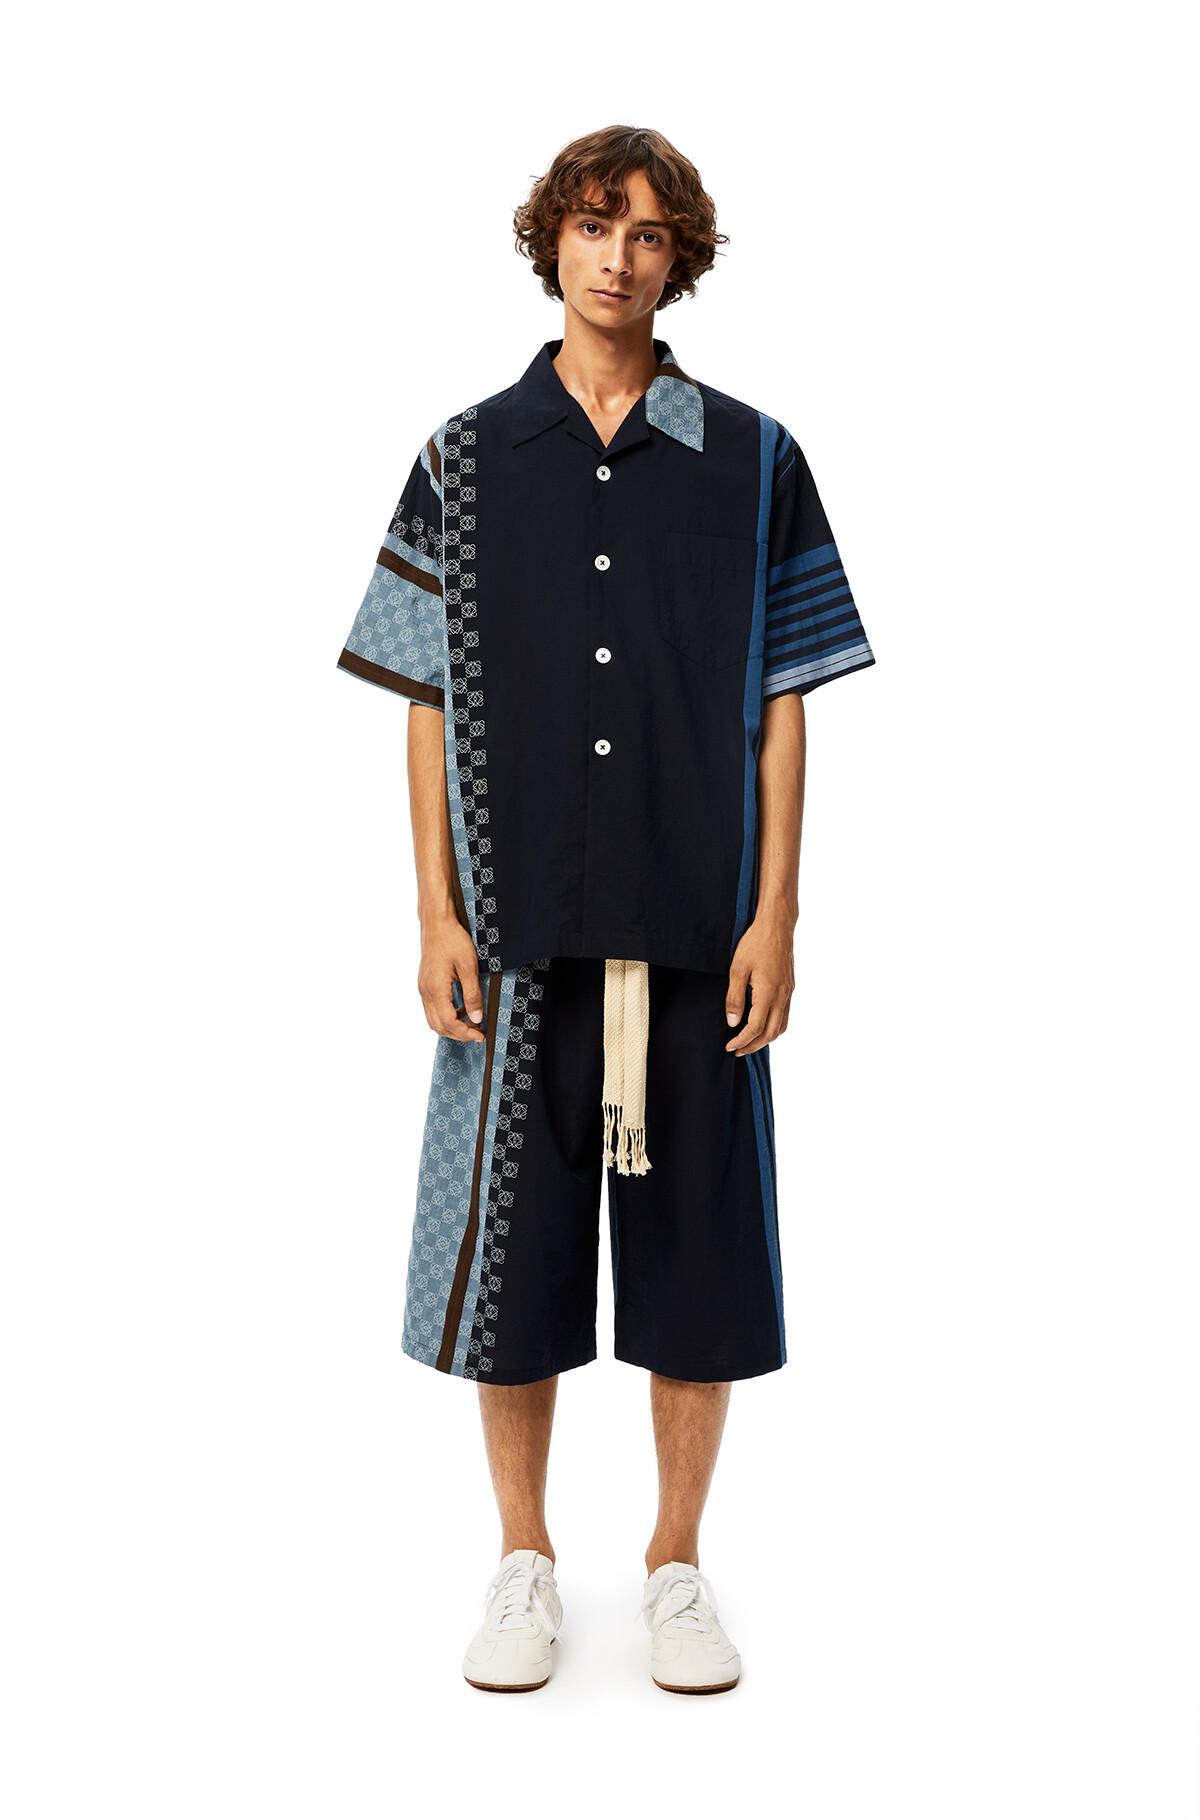 LOEWE Stripe Anagram Shorts Navy Blue/Multicolor front